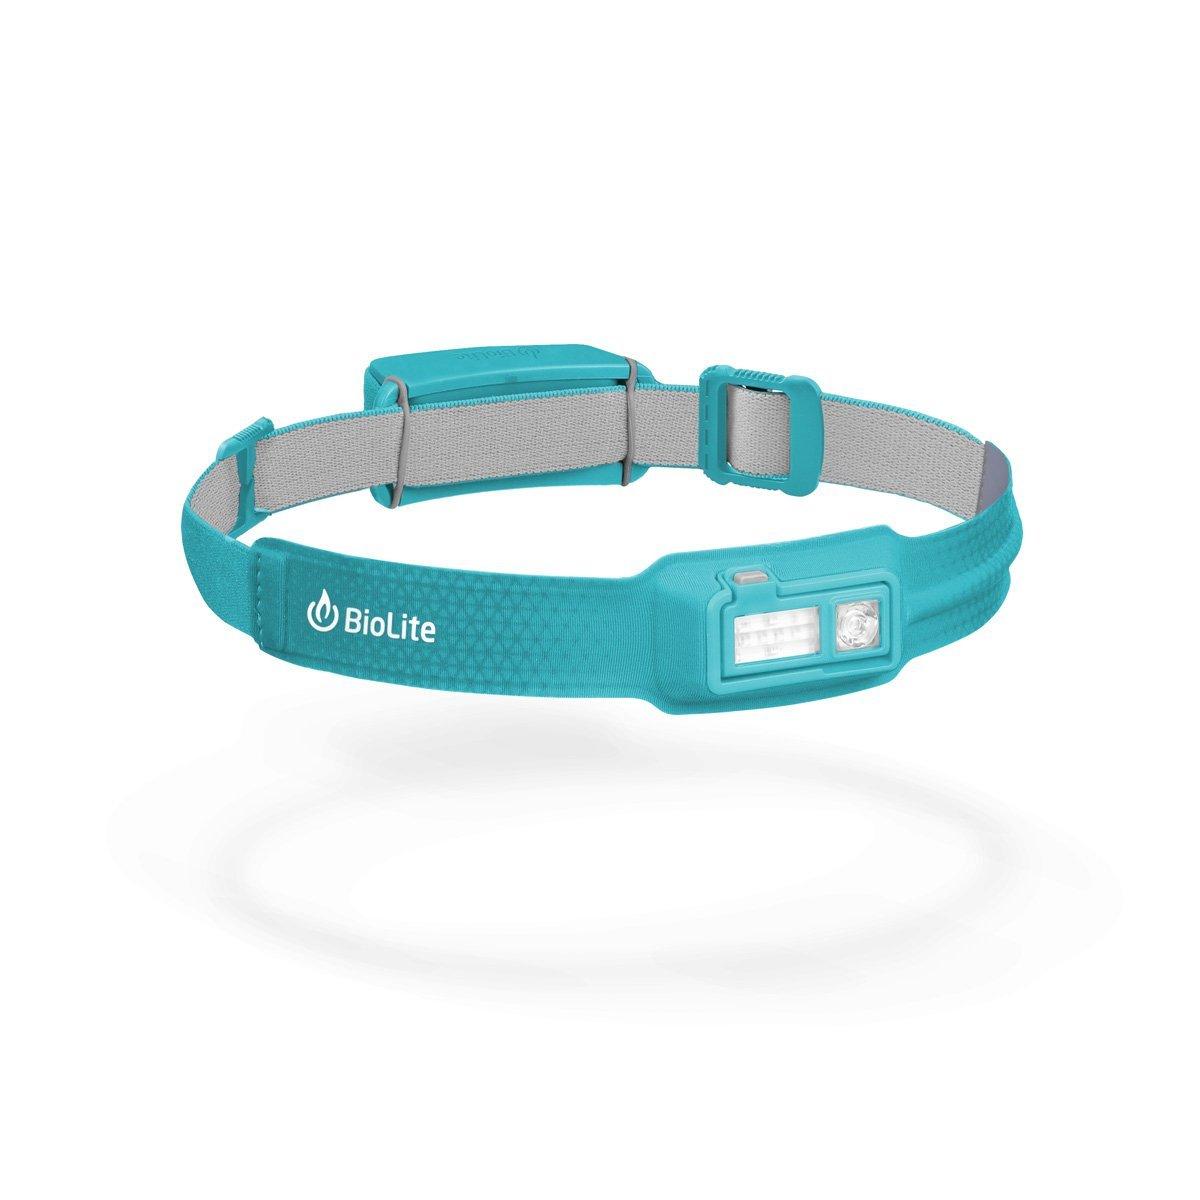 BioLite Headlamp 330 - Teal